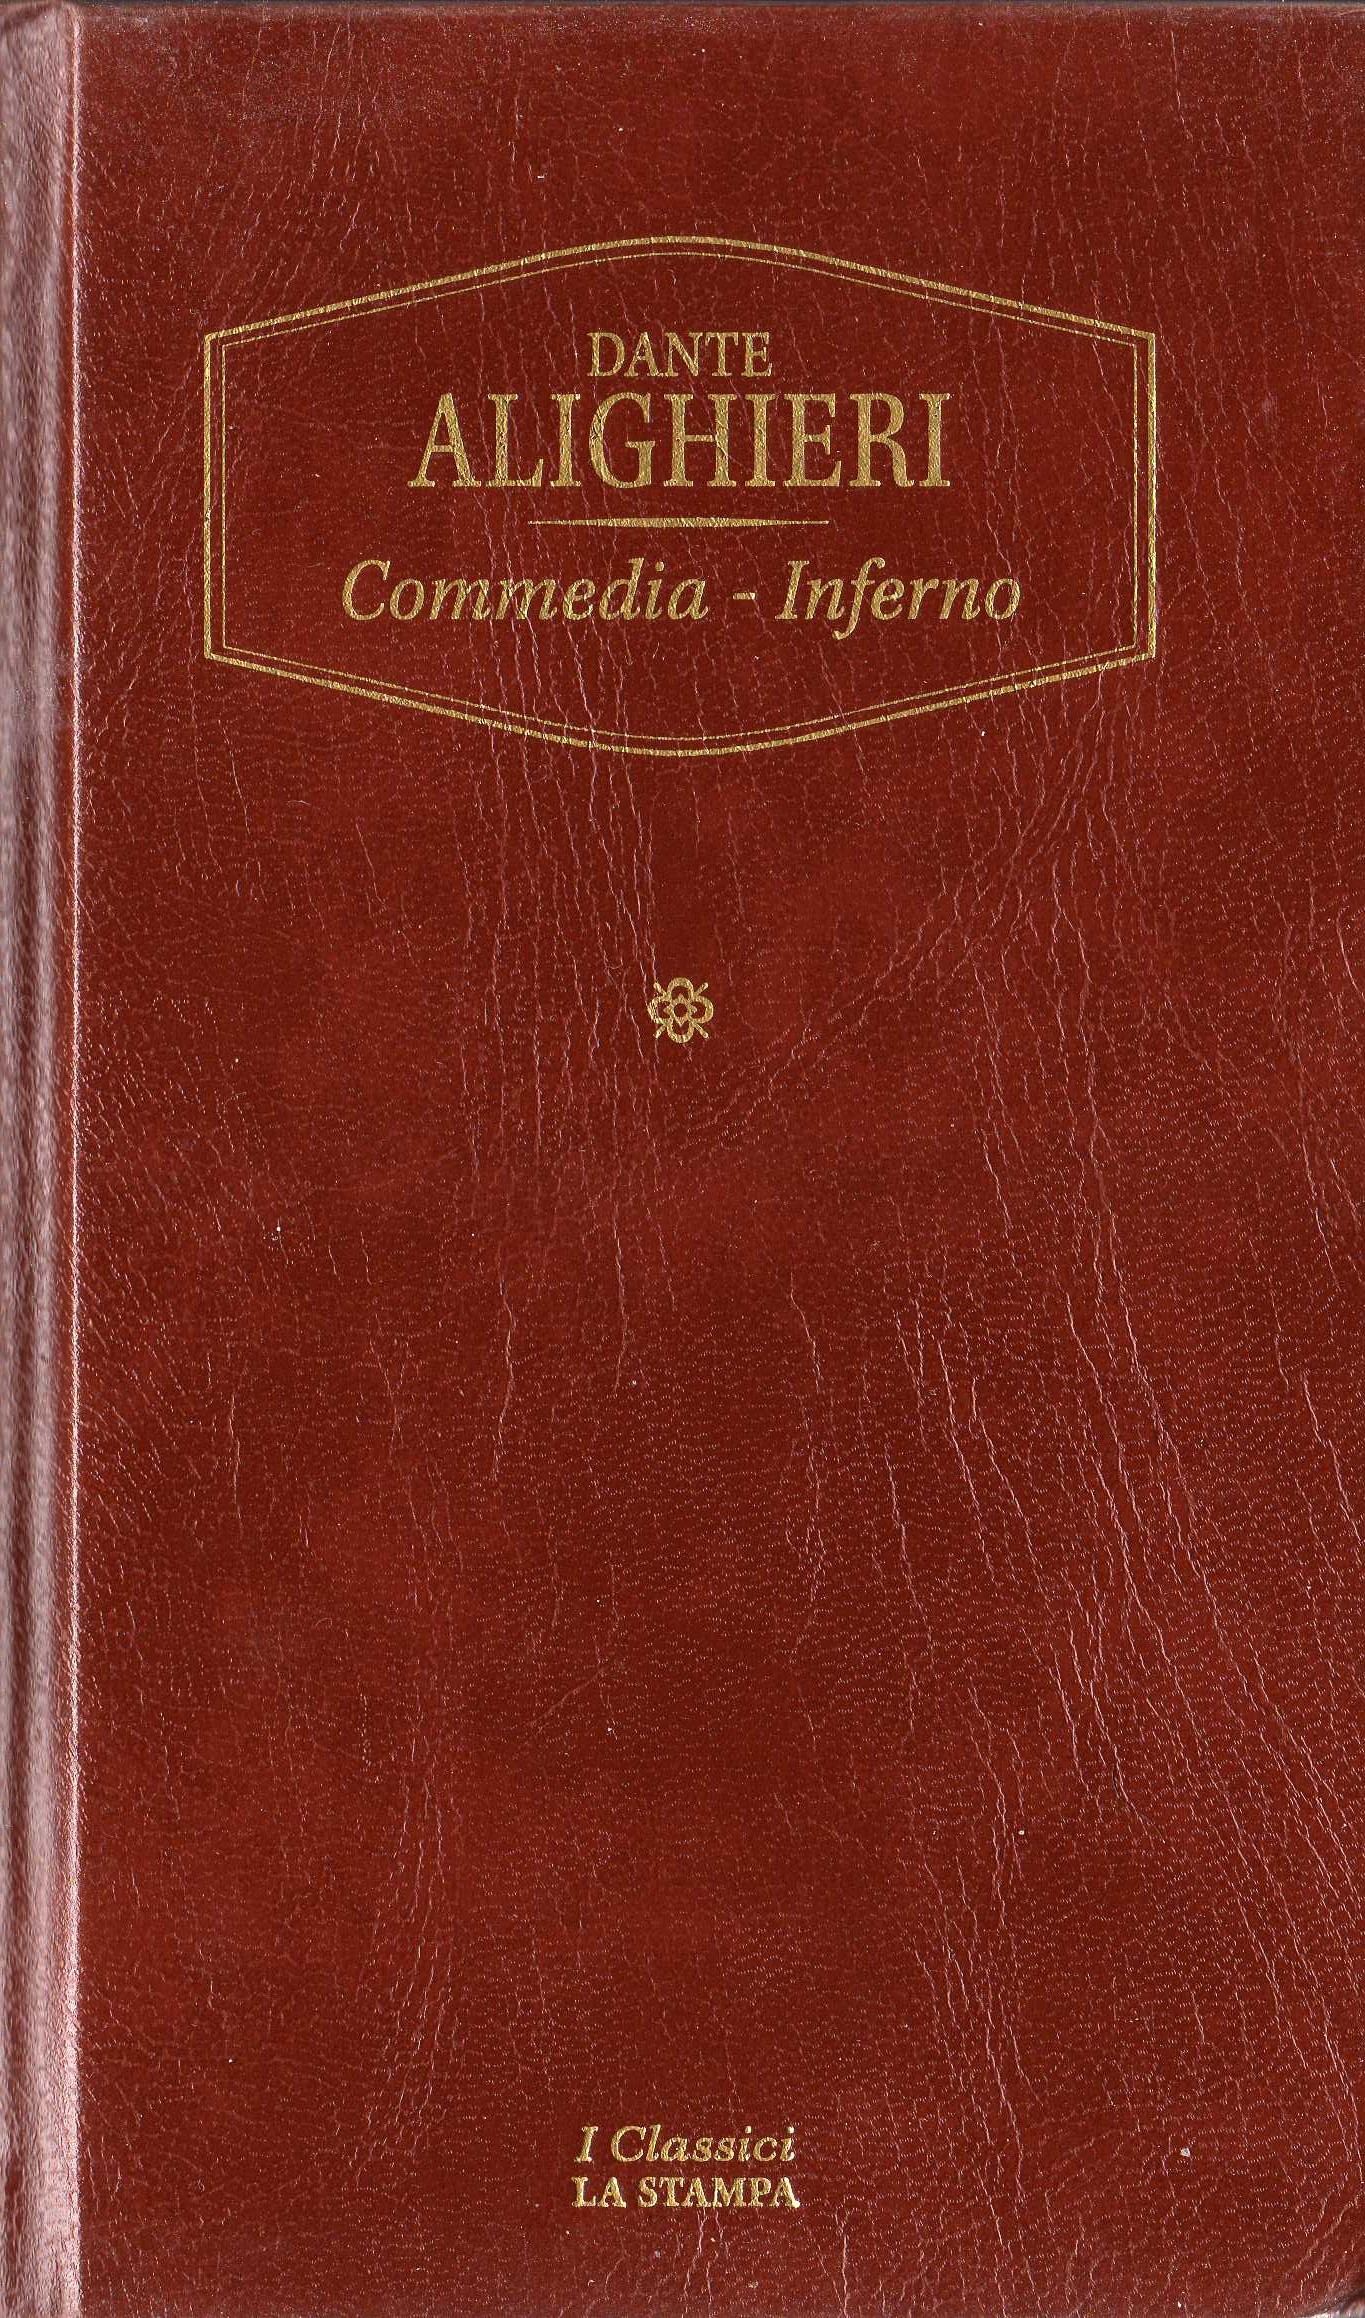 Commedia - Inferno